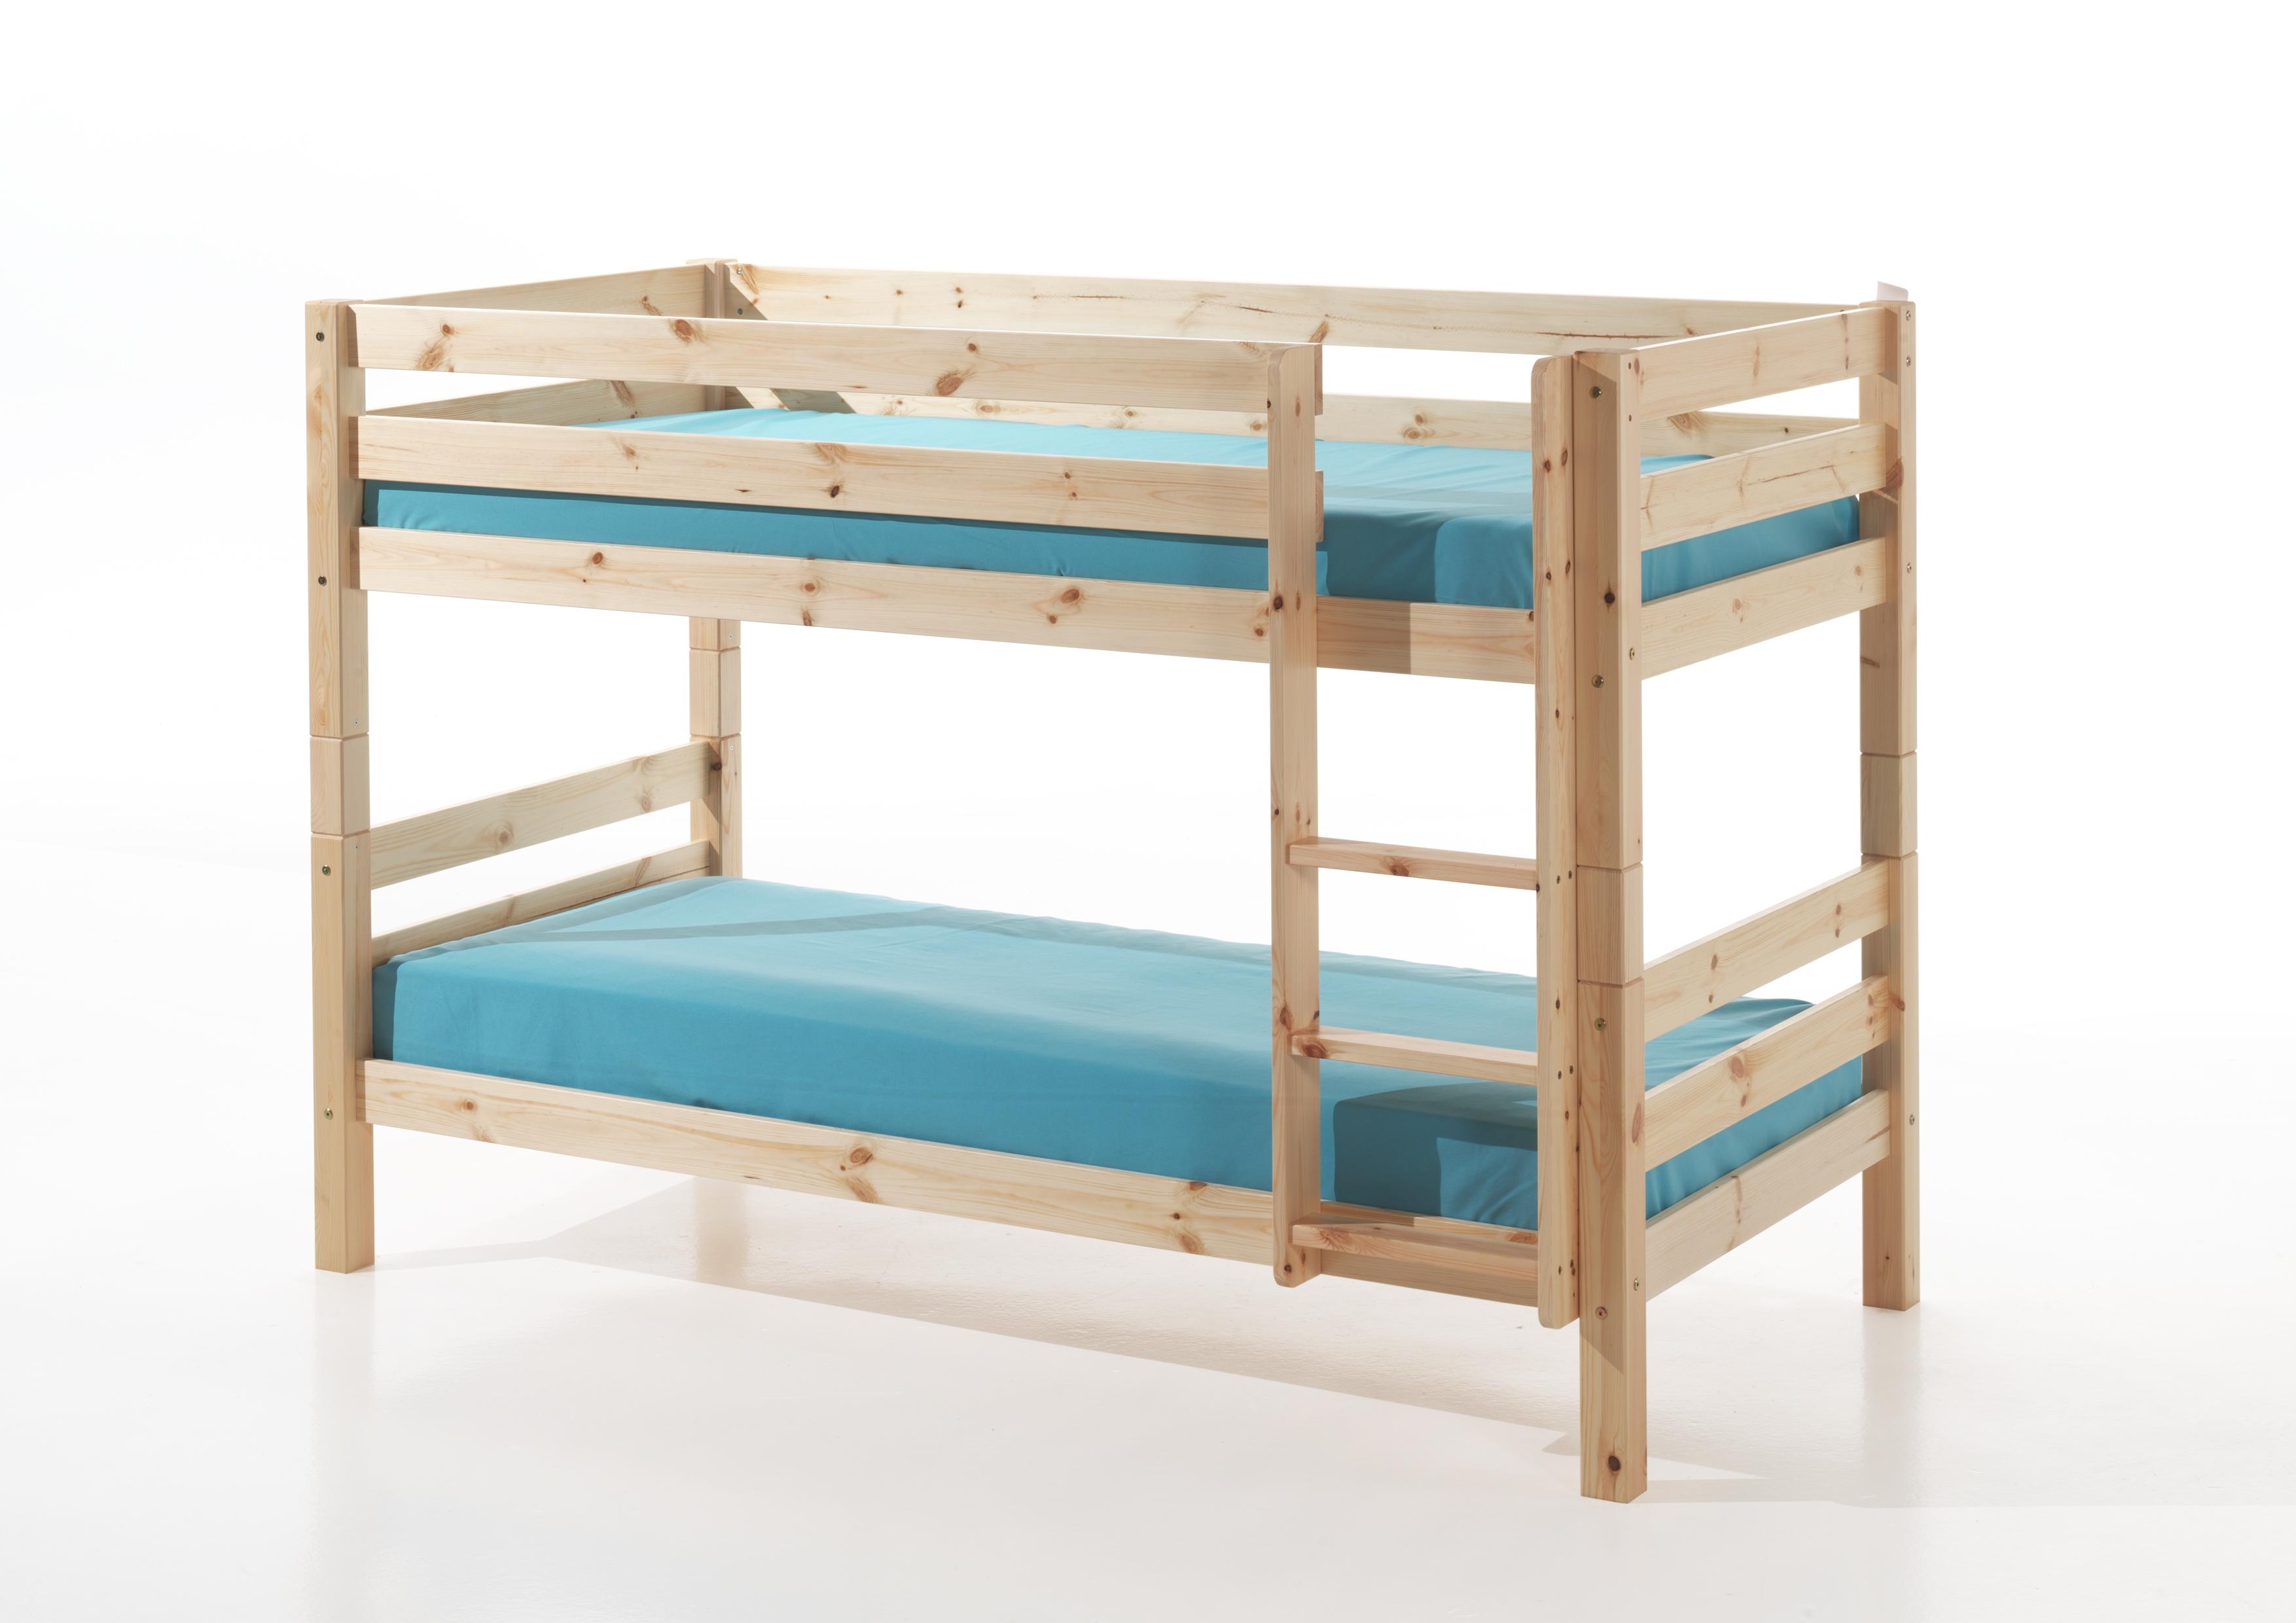 Pat etajat din lemn de pin pentru copii Pino Small Natural, 200 x 90 cm